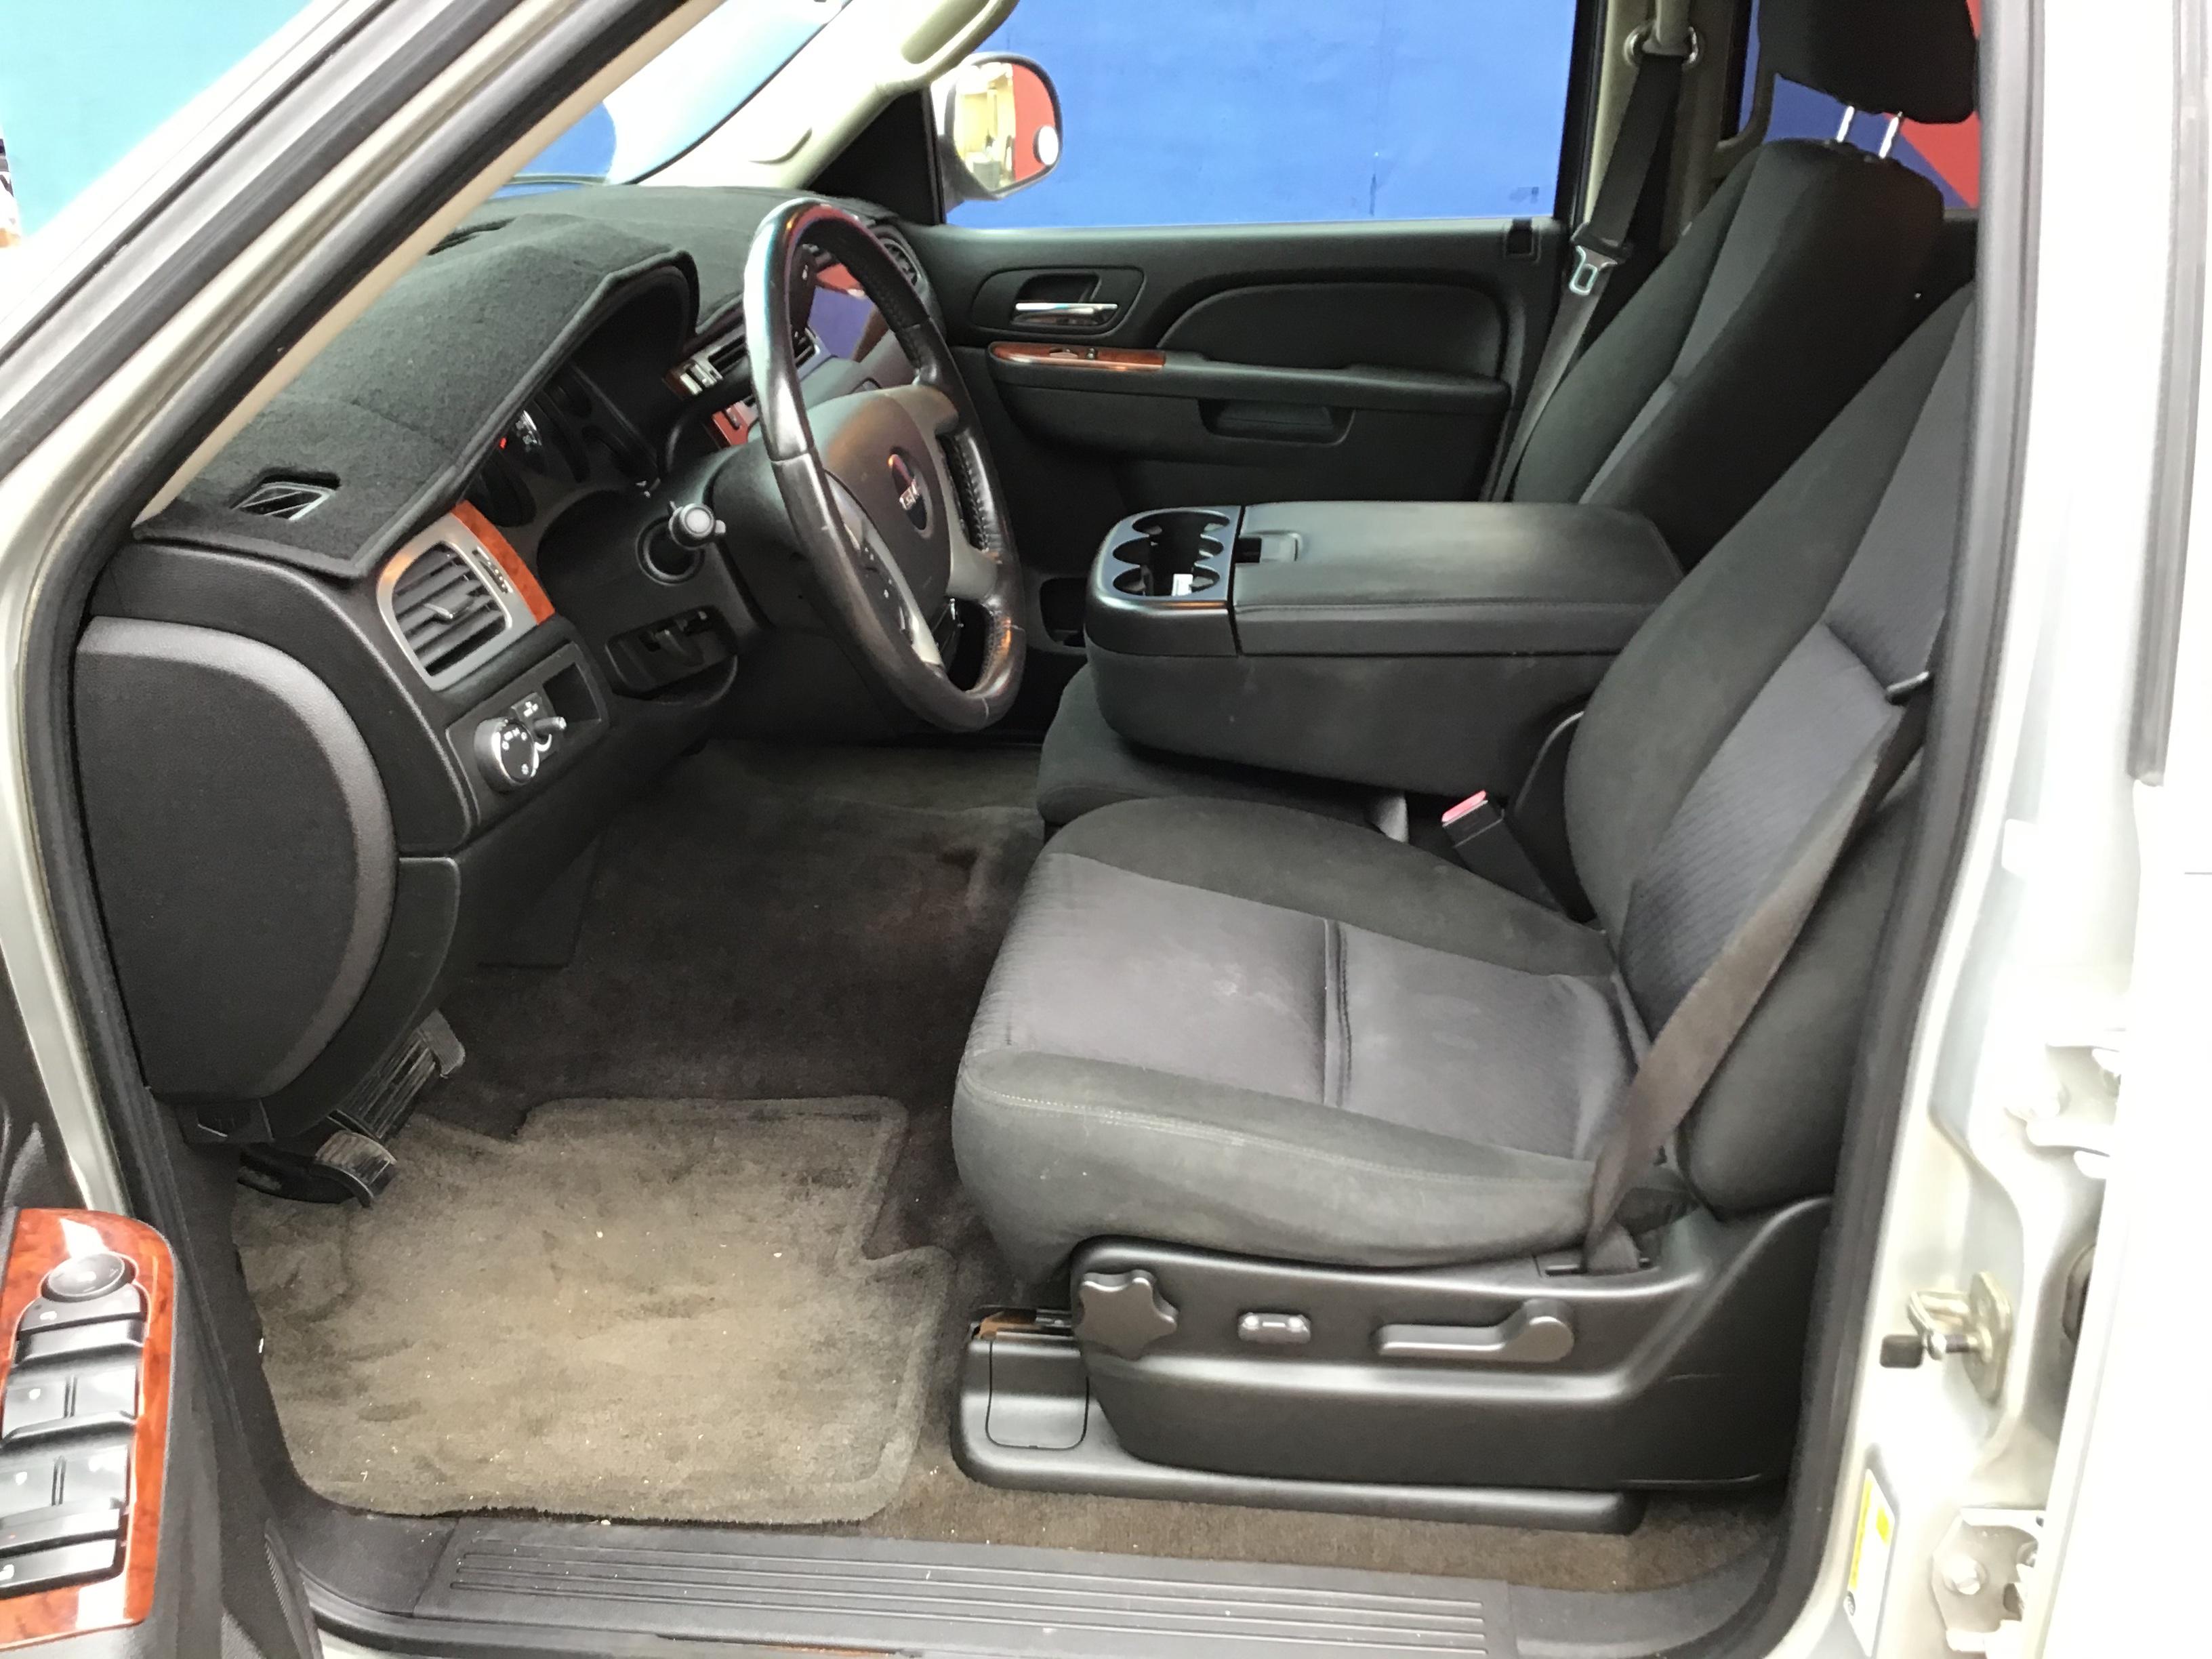 used vehicle - SUV GMC YUKON 2010